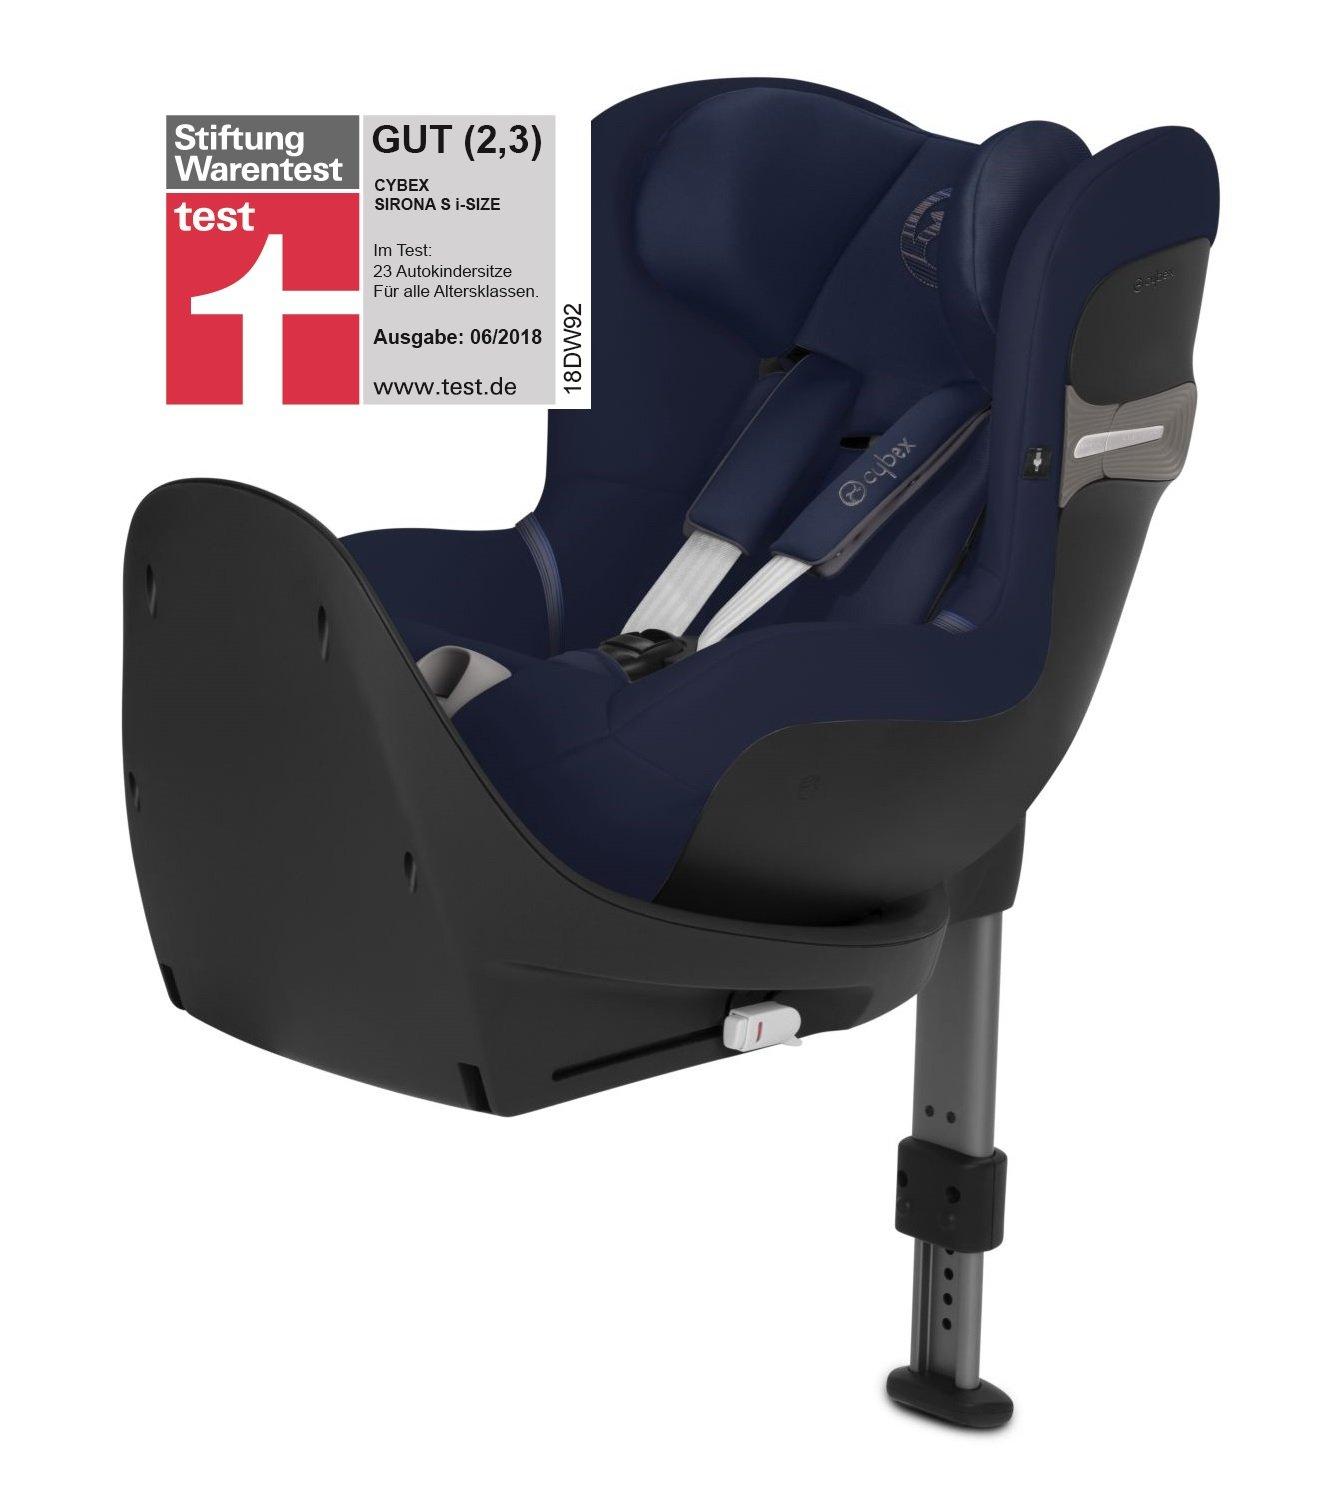 cybex reboard child car seat sirona s i size 2018 denim. Black Bedroom Furniture Sets. Home Design Ideas